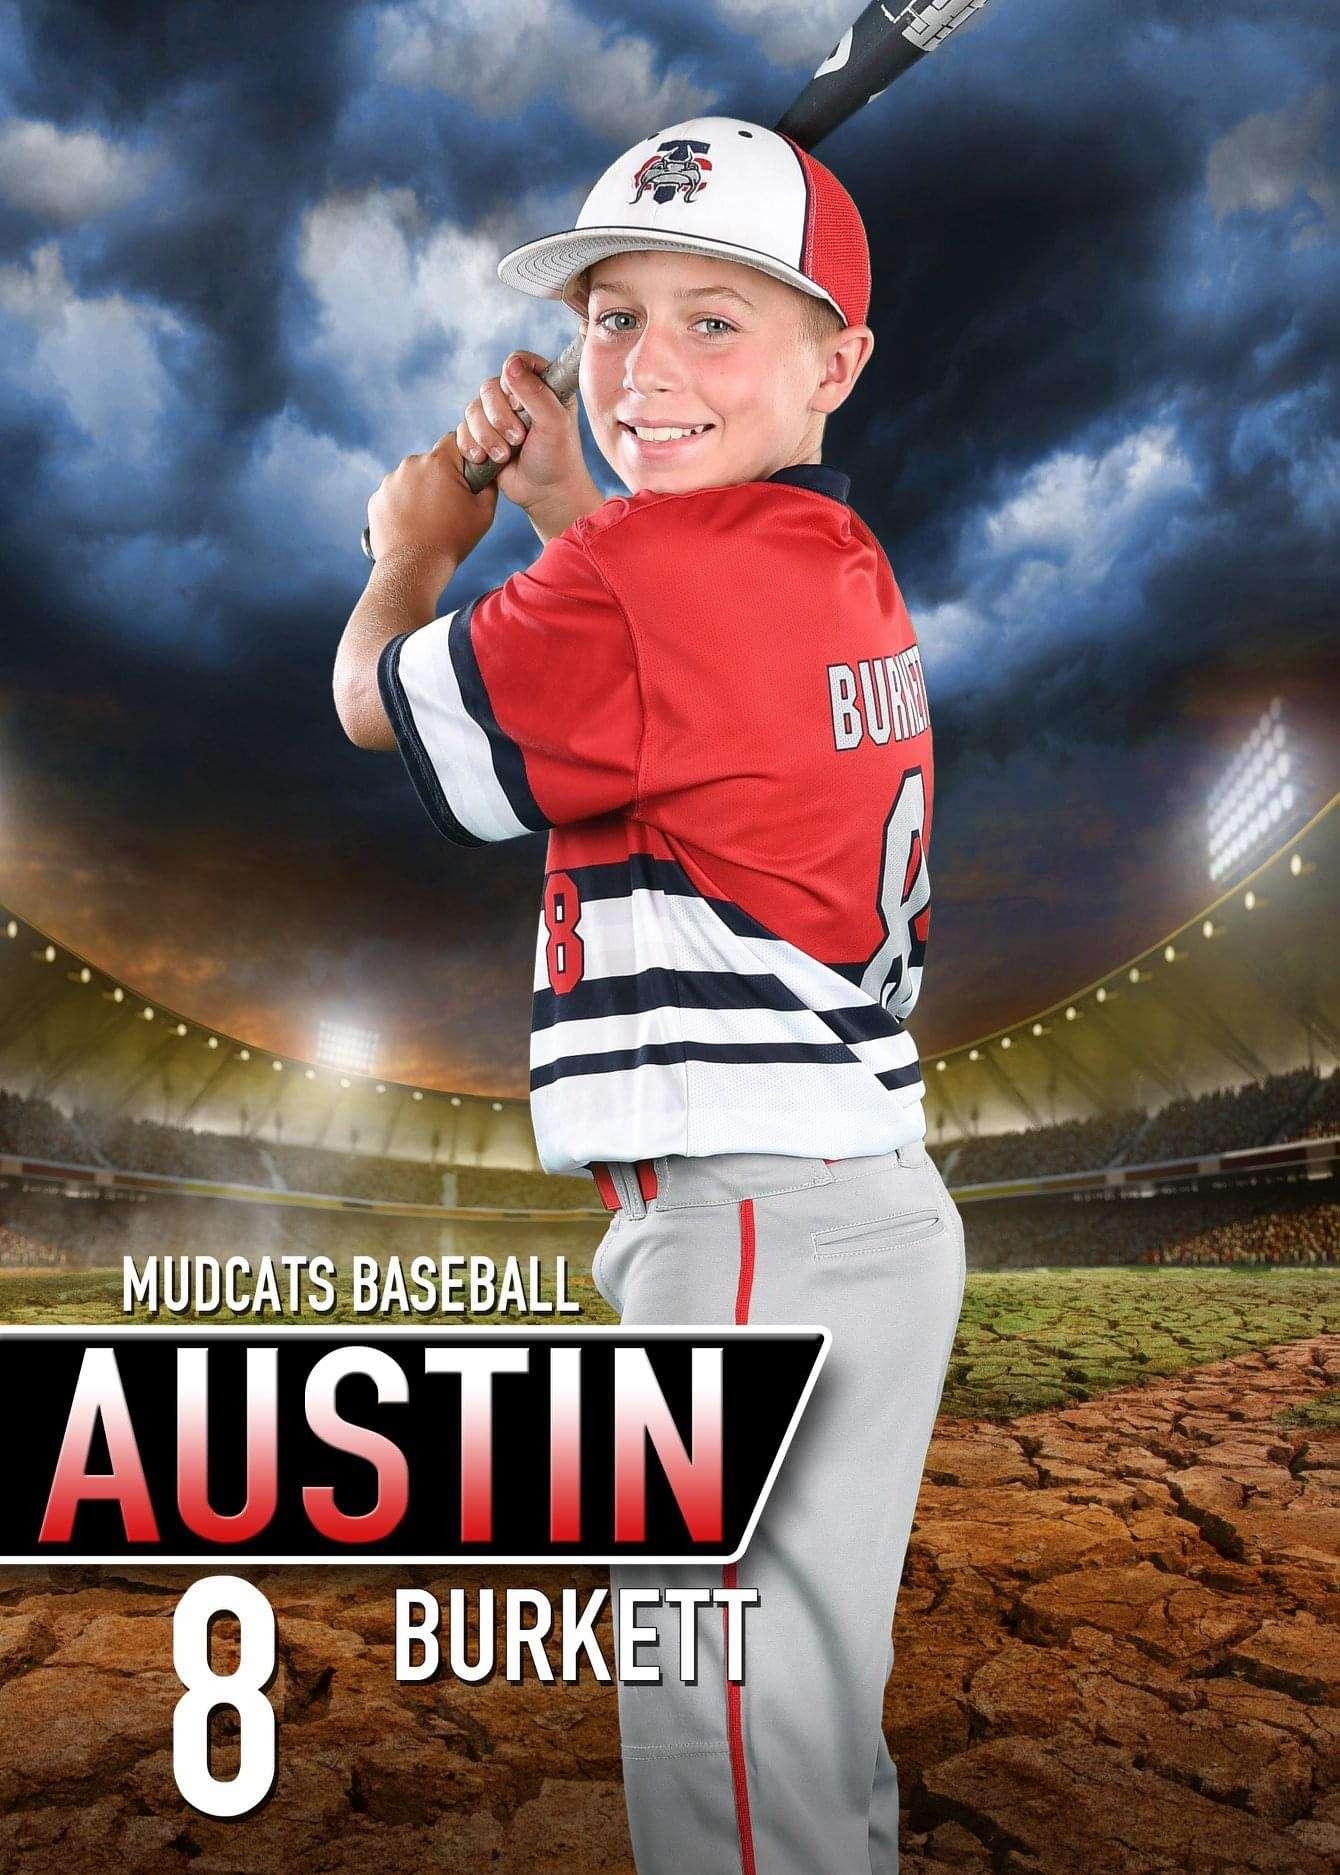 Austin Burkett